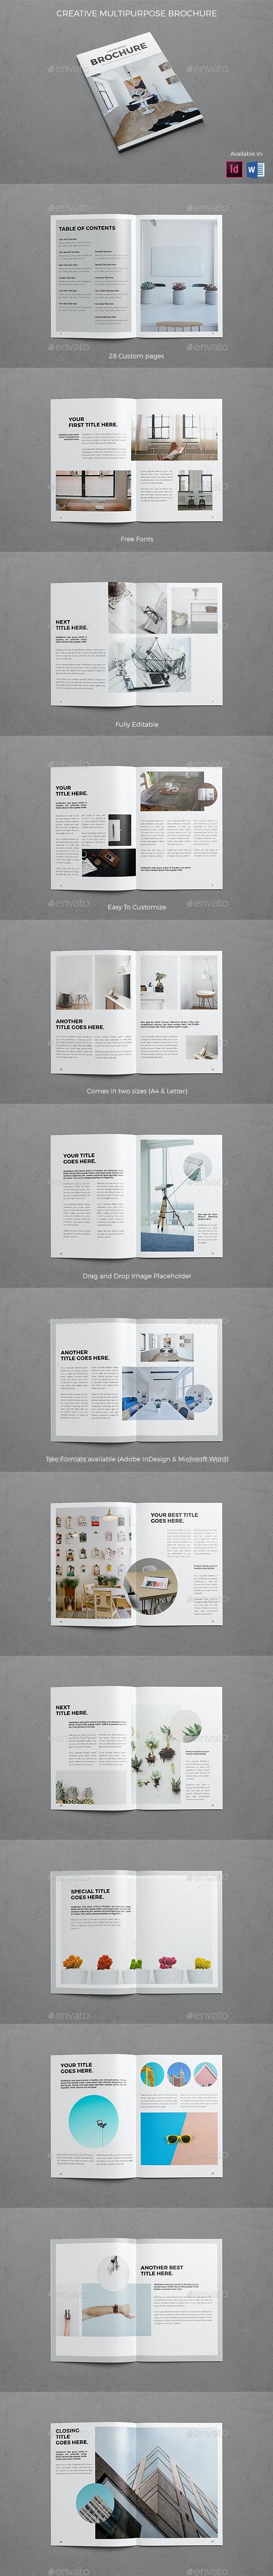 Creative Multipurpose Brochure - Brochures Print Templates